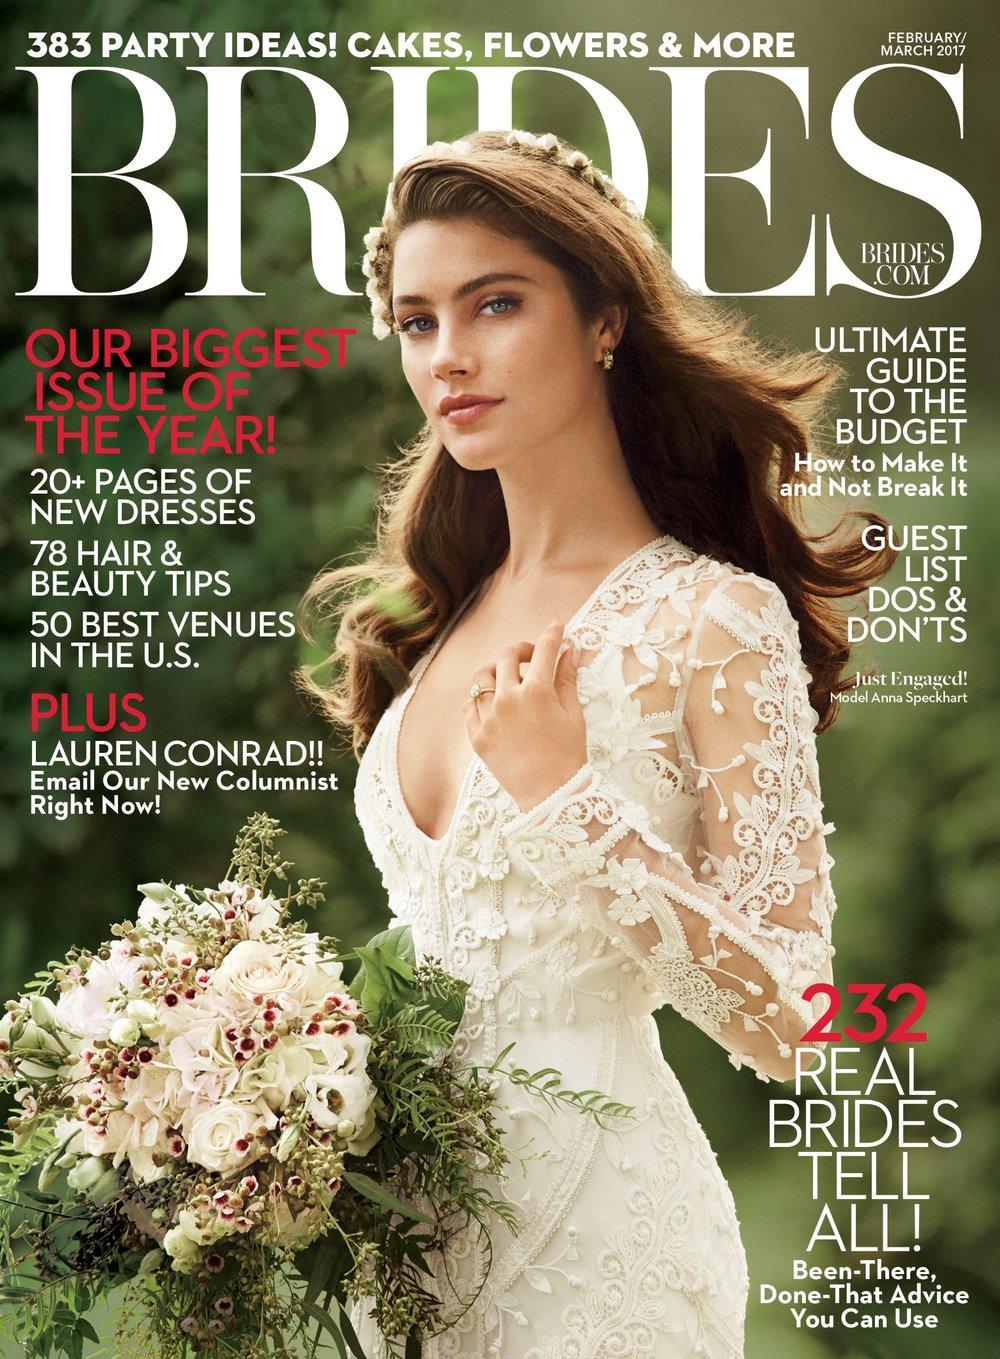 brides - bridal / lifestyle